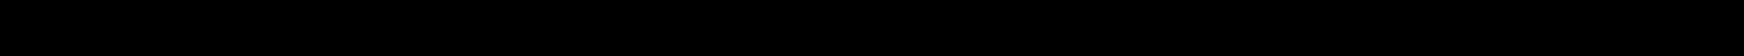 MatrixScriptOTGR-Reg.otf